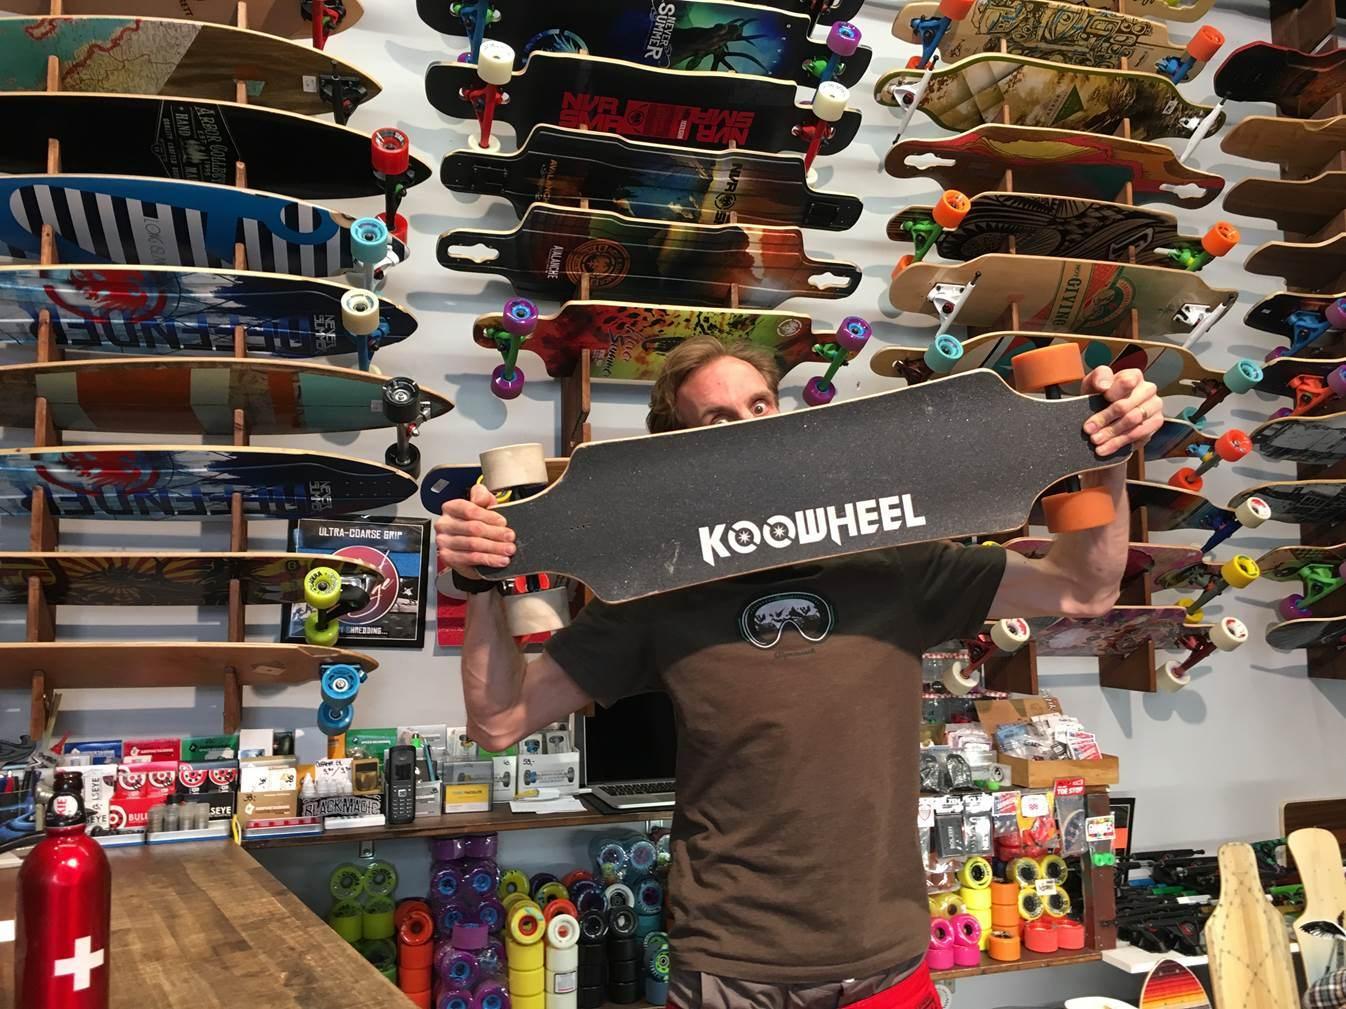 2017 High Speed Koowheel Electric Skateboard (D3M) with Dual Hub Motors